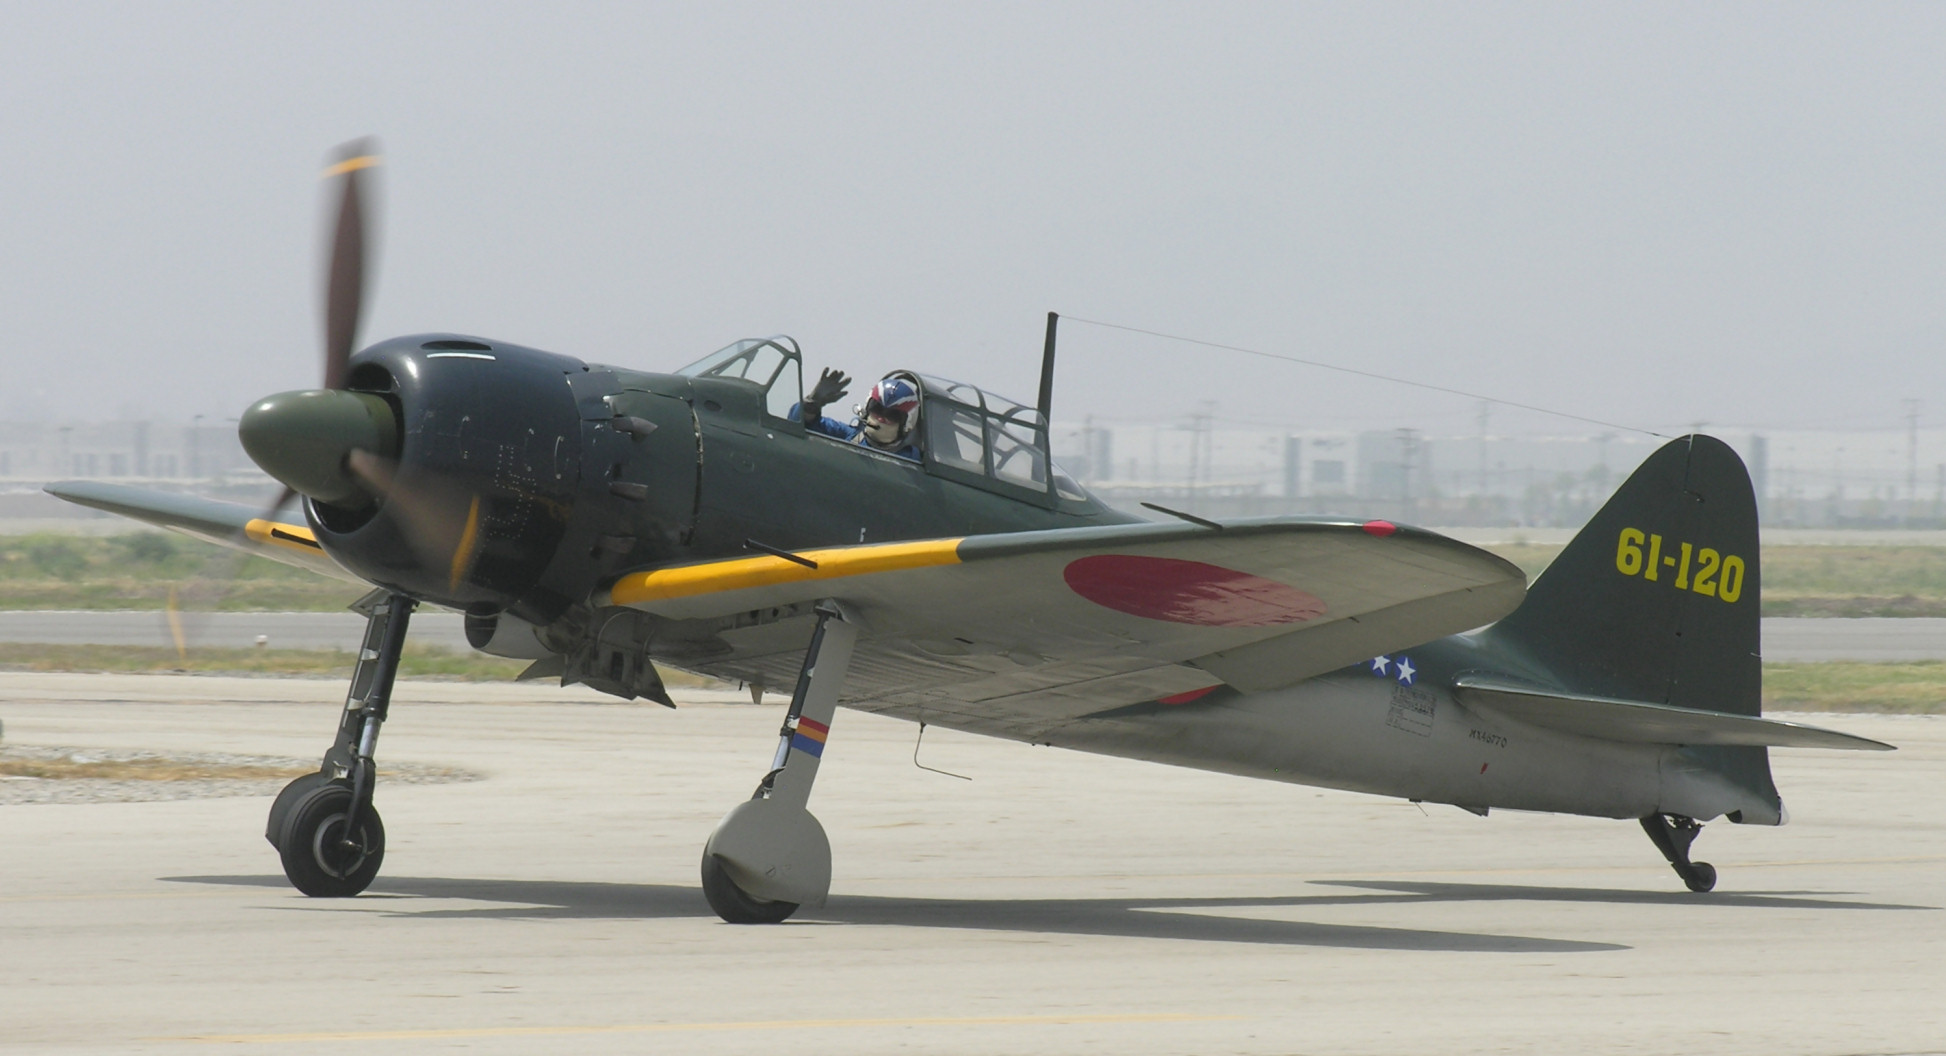 File:Mitsubishi A6M Zero, Chino, California.jpg - Wikimedia Commons